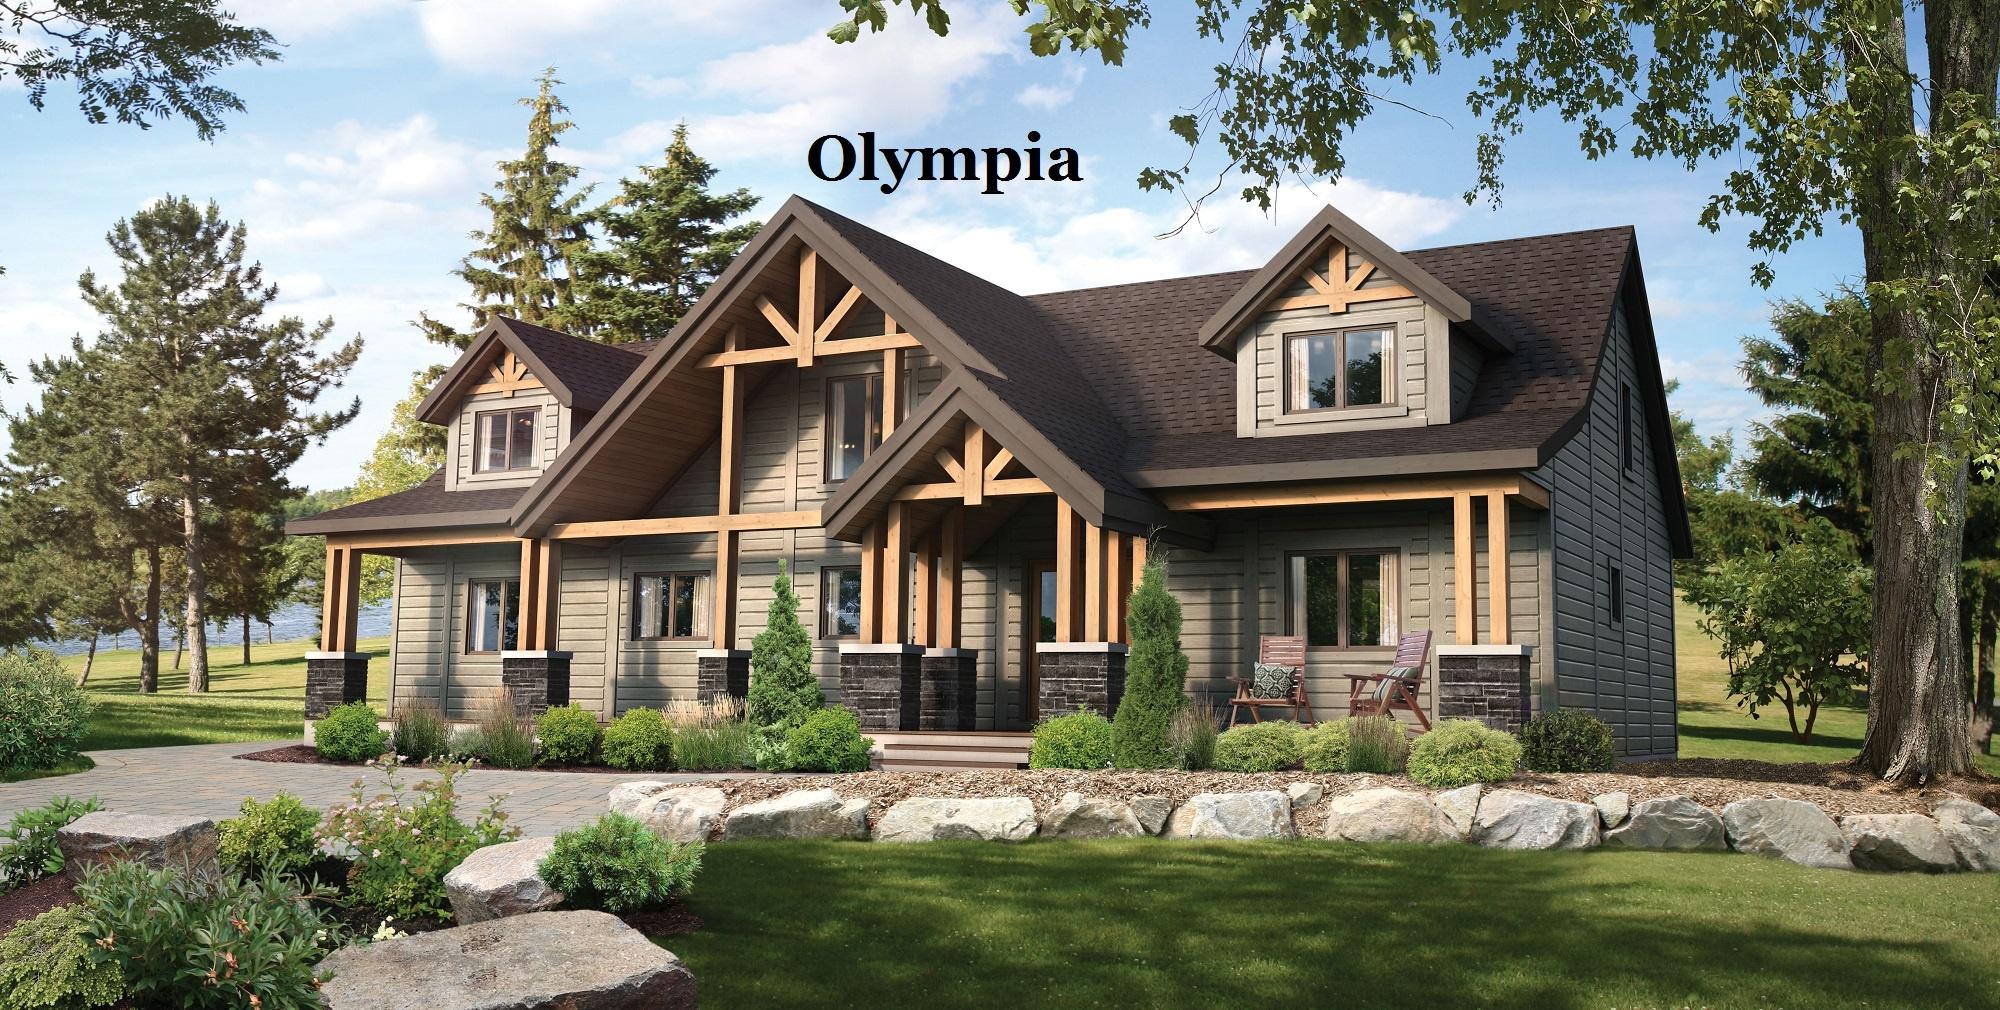 OLYMPIA-text.jpg